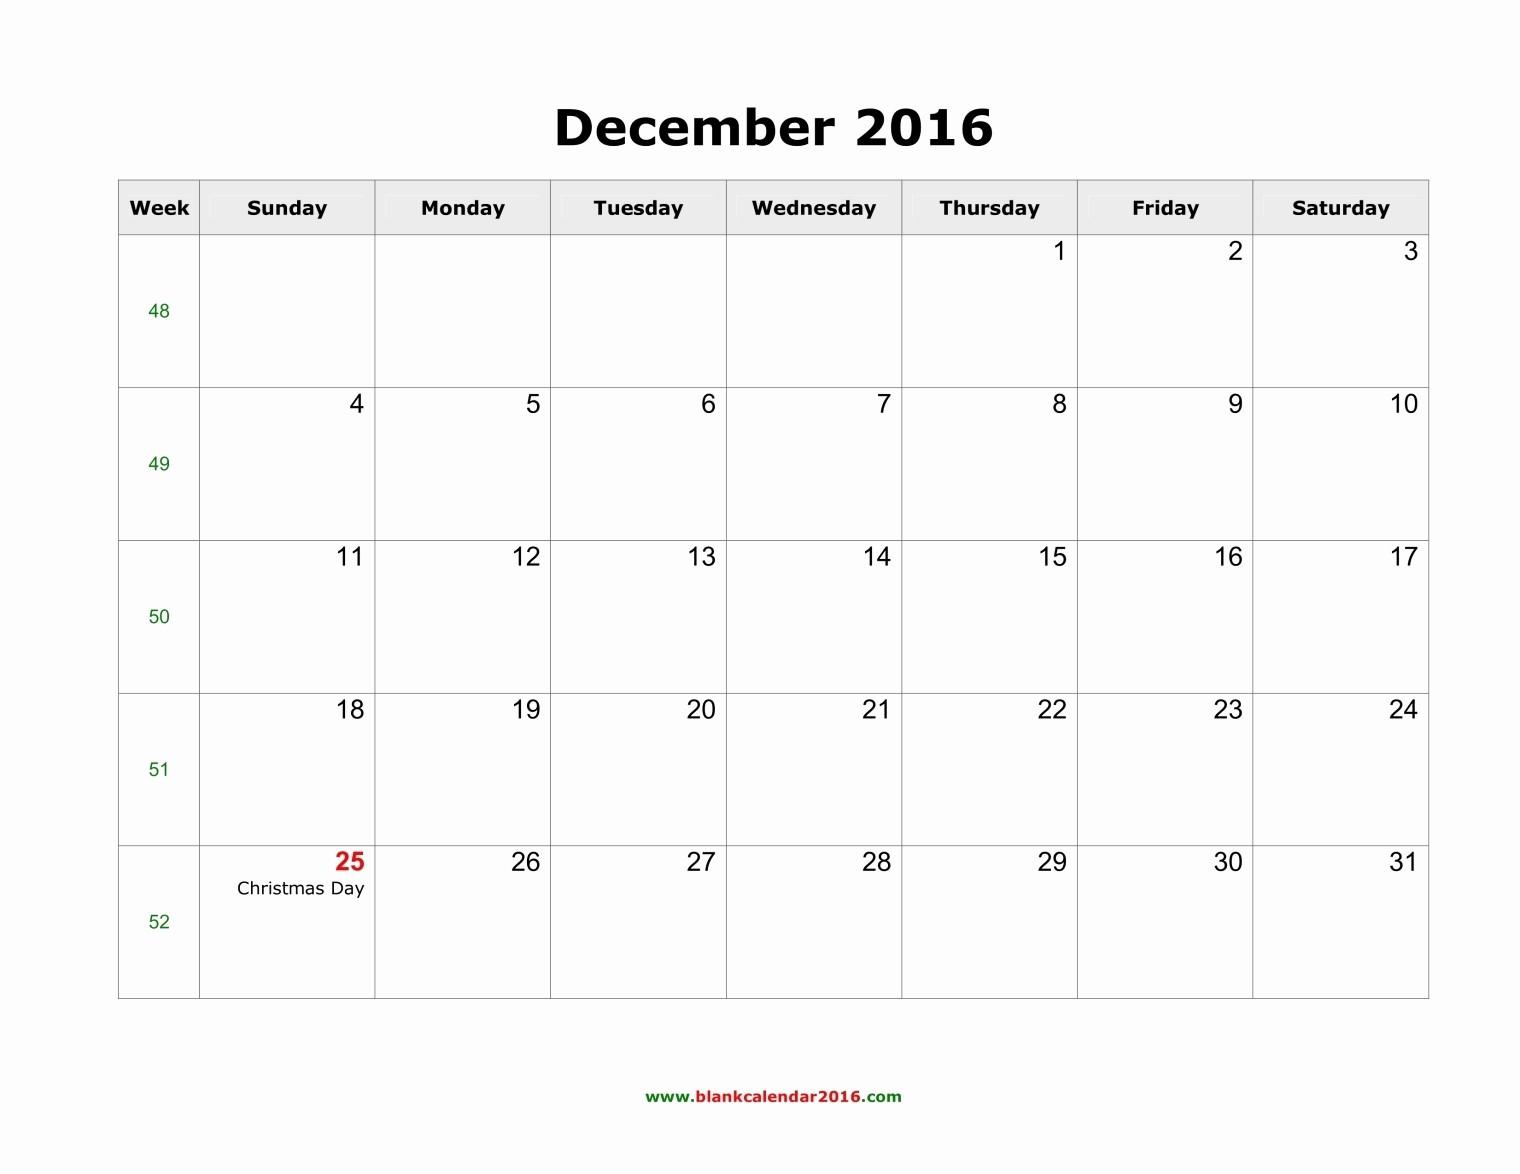 Blank December Calendar 2016 Printable Fresh December 2016 Calendar Printable with Holidays – Templates